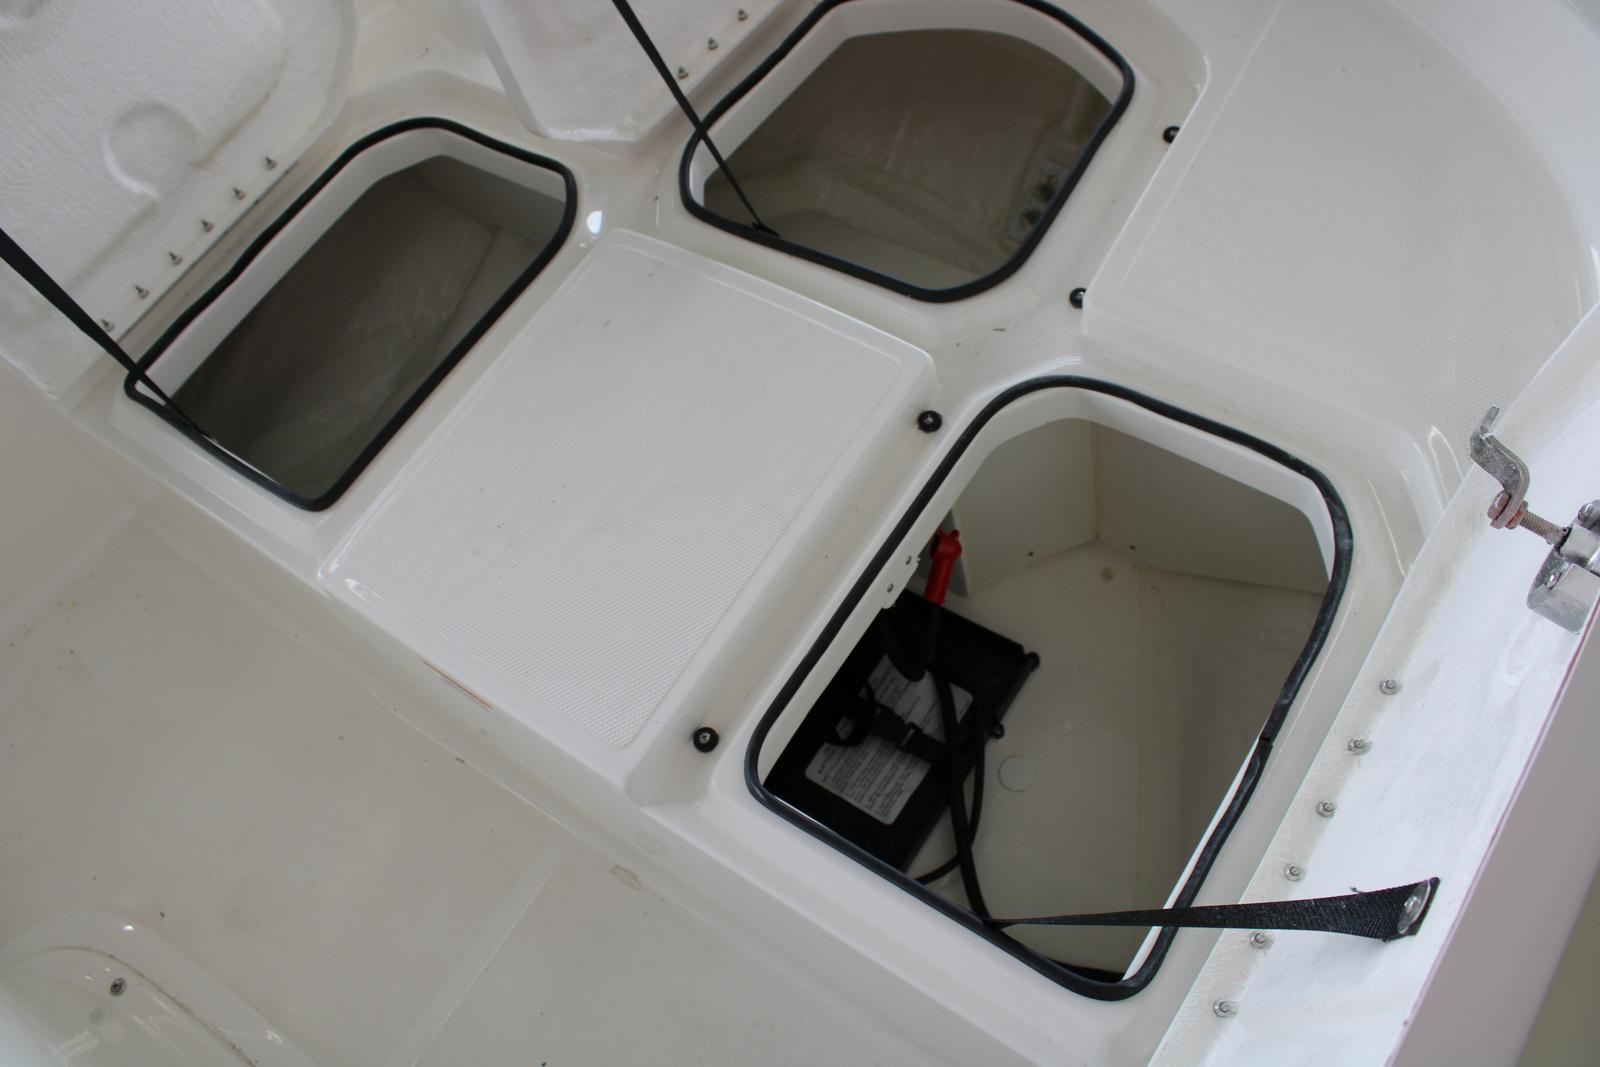 2019 Bayliner boat for sale, model of the boat is Element F18 & Image # 5 of 6